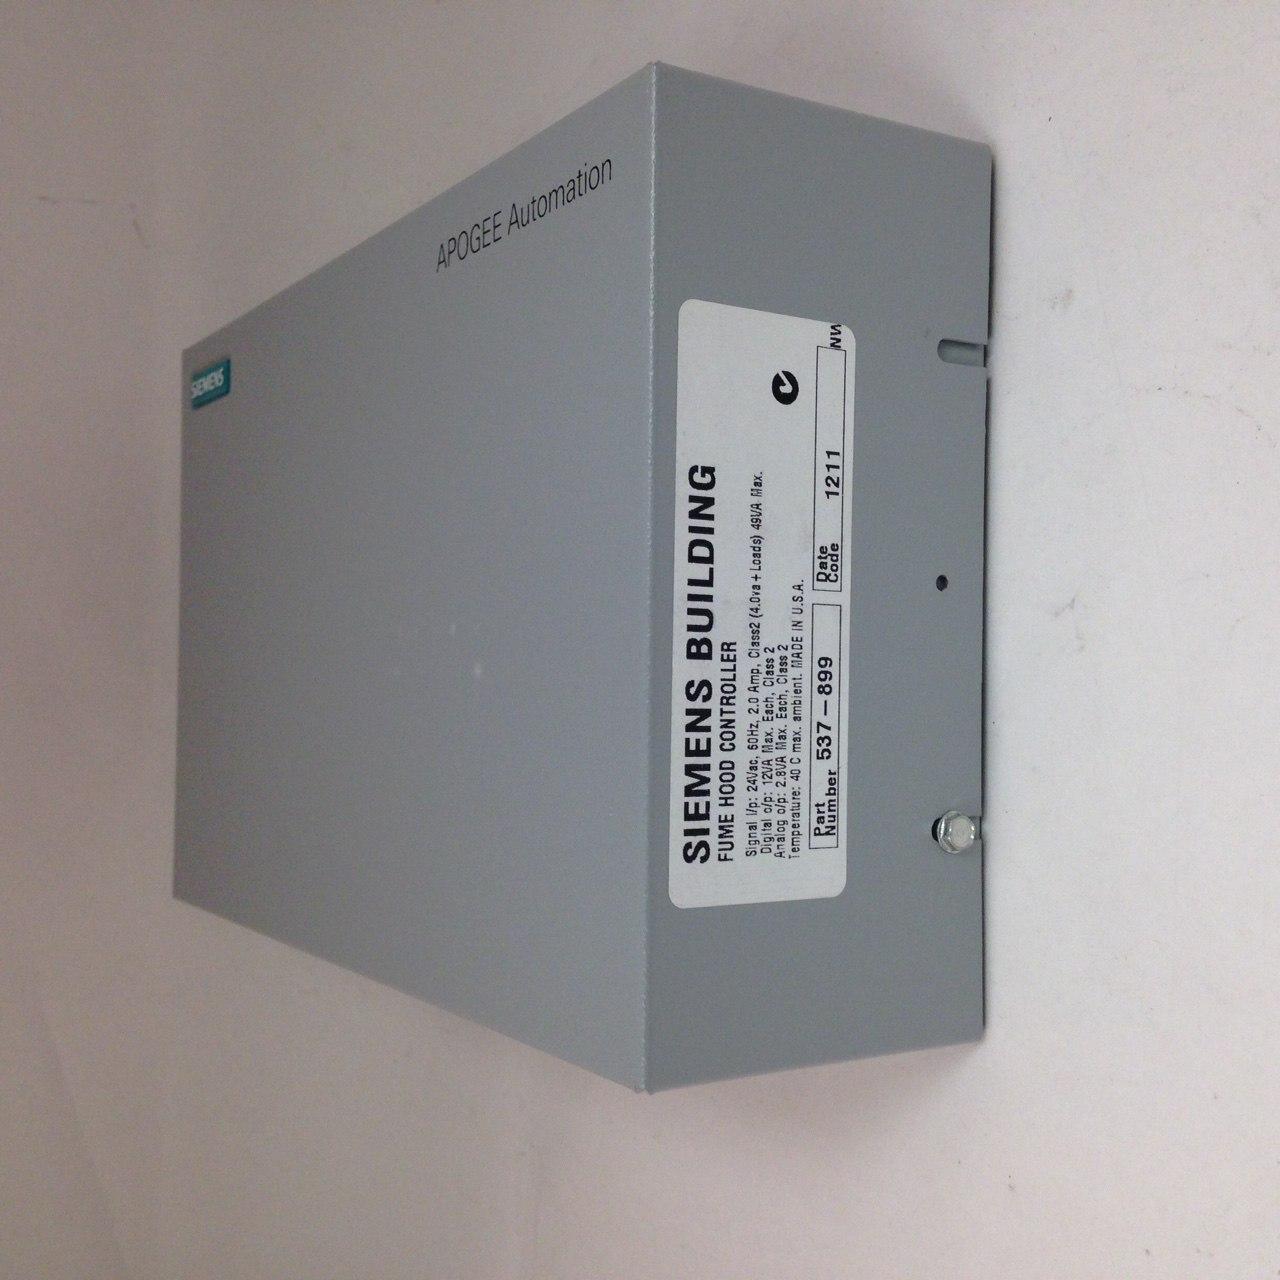 Siemens 537-899 Fume Hood Controller Enclosure